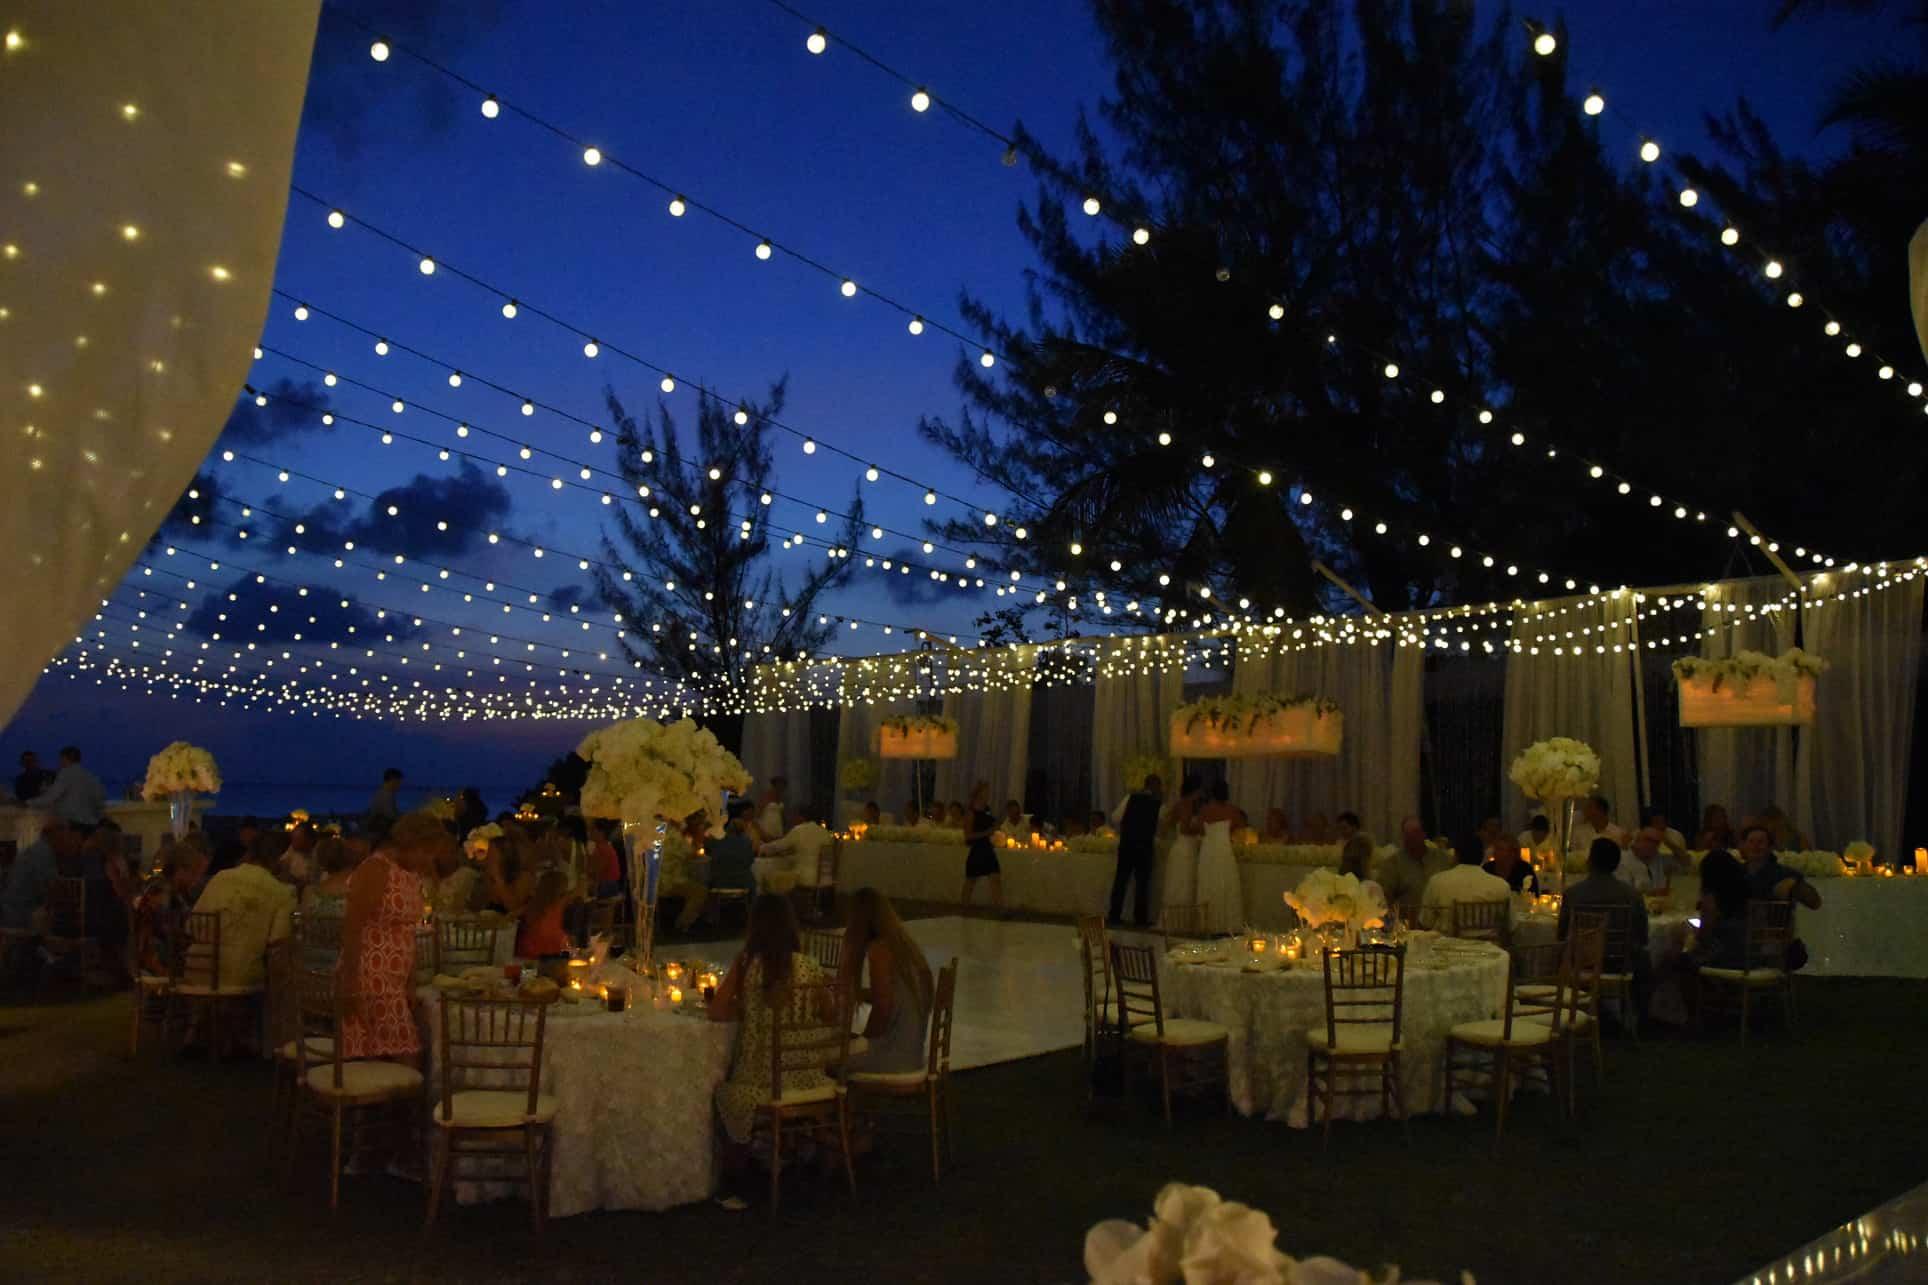 wedding under the moonlight reception beach, twinkle lights, fairy lights, party globe lights